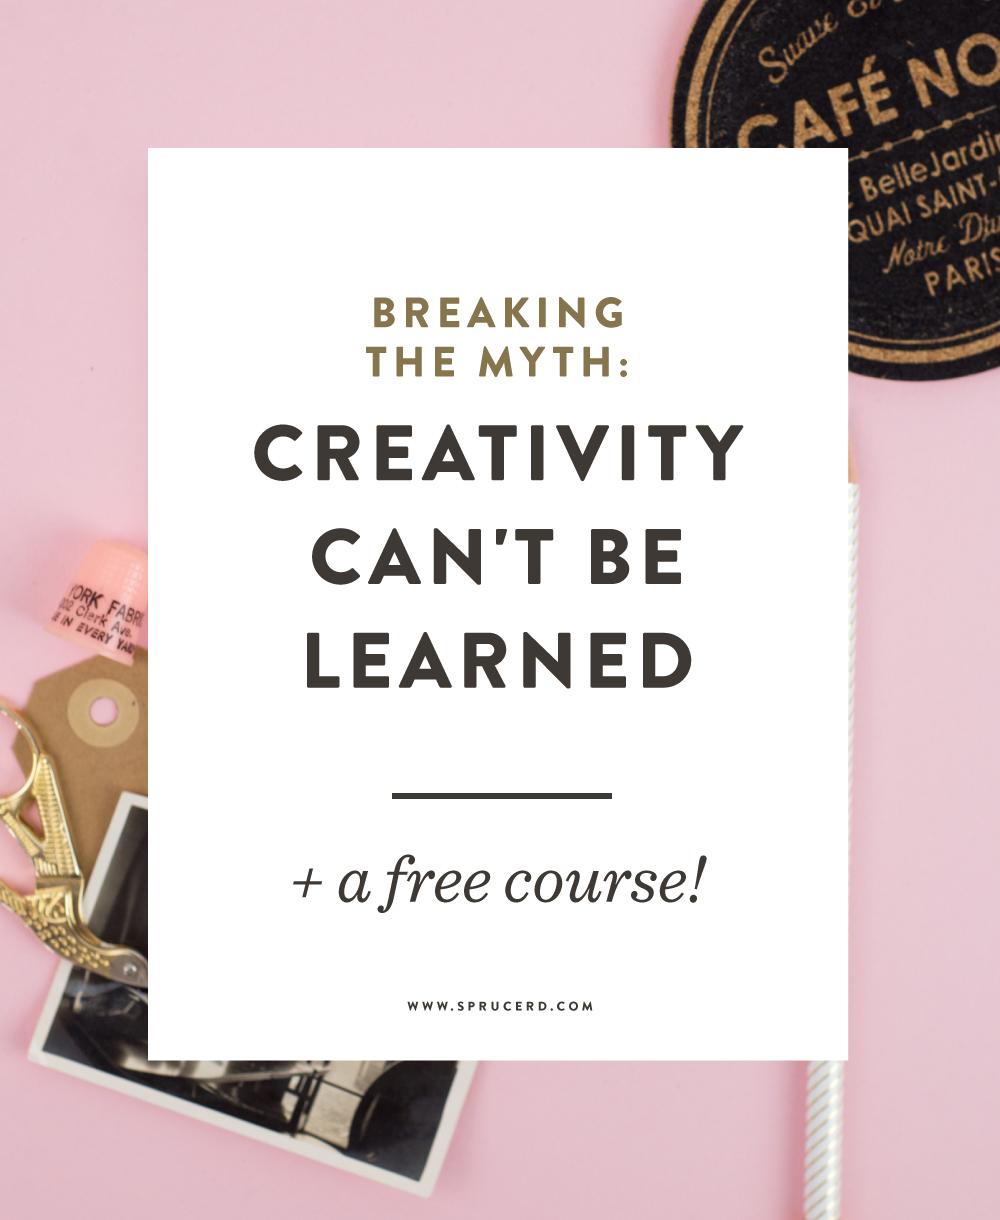 Creativity-Learned.jpg